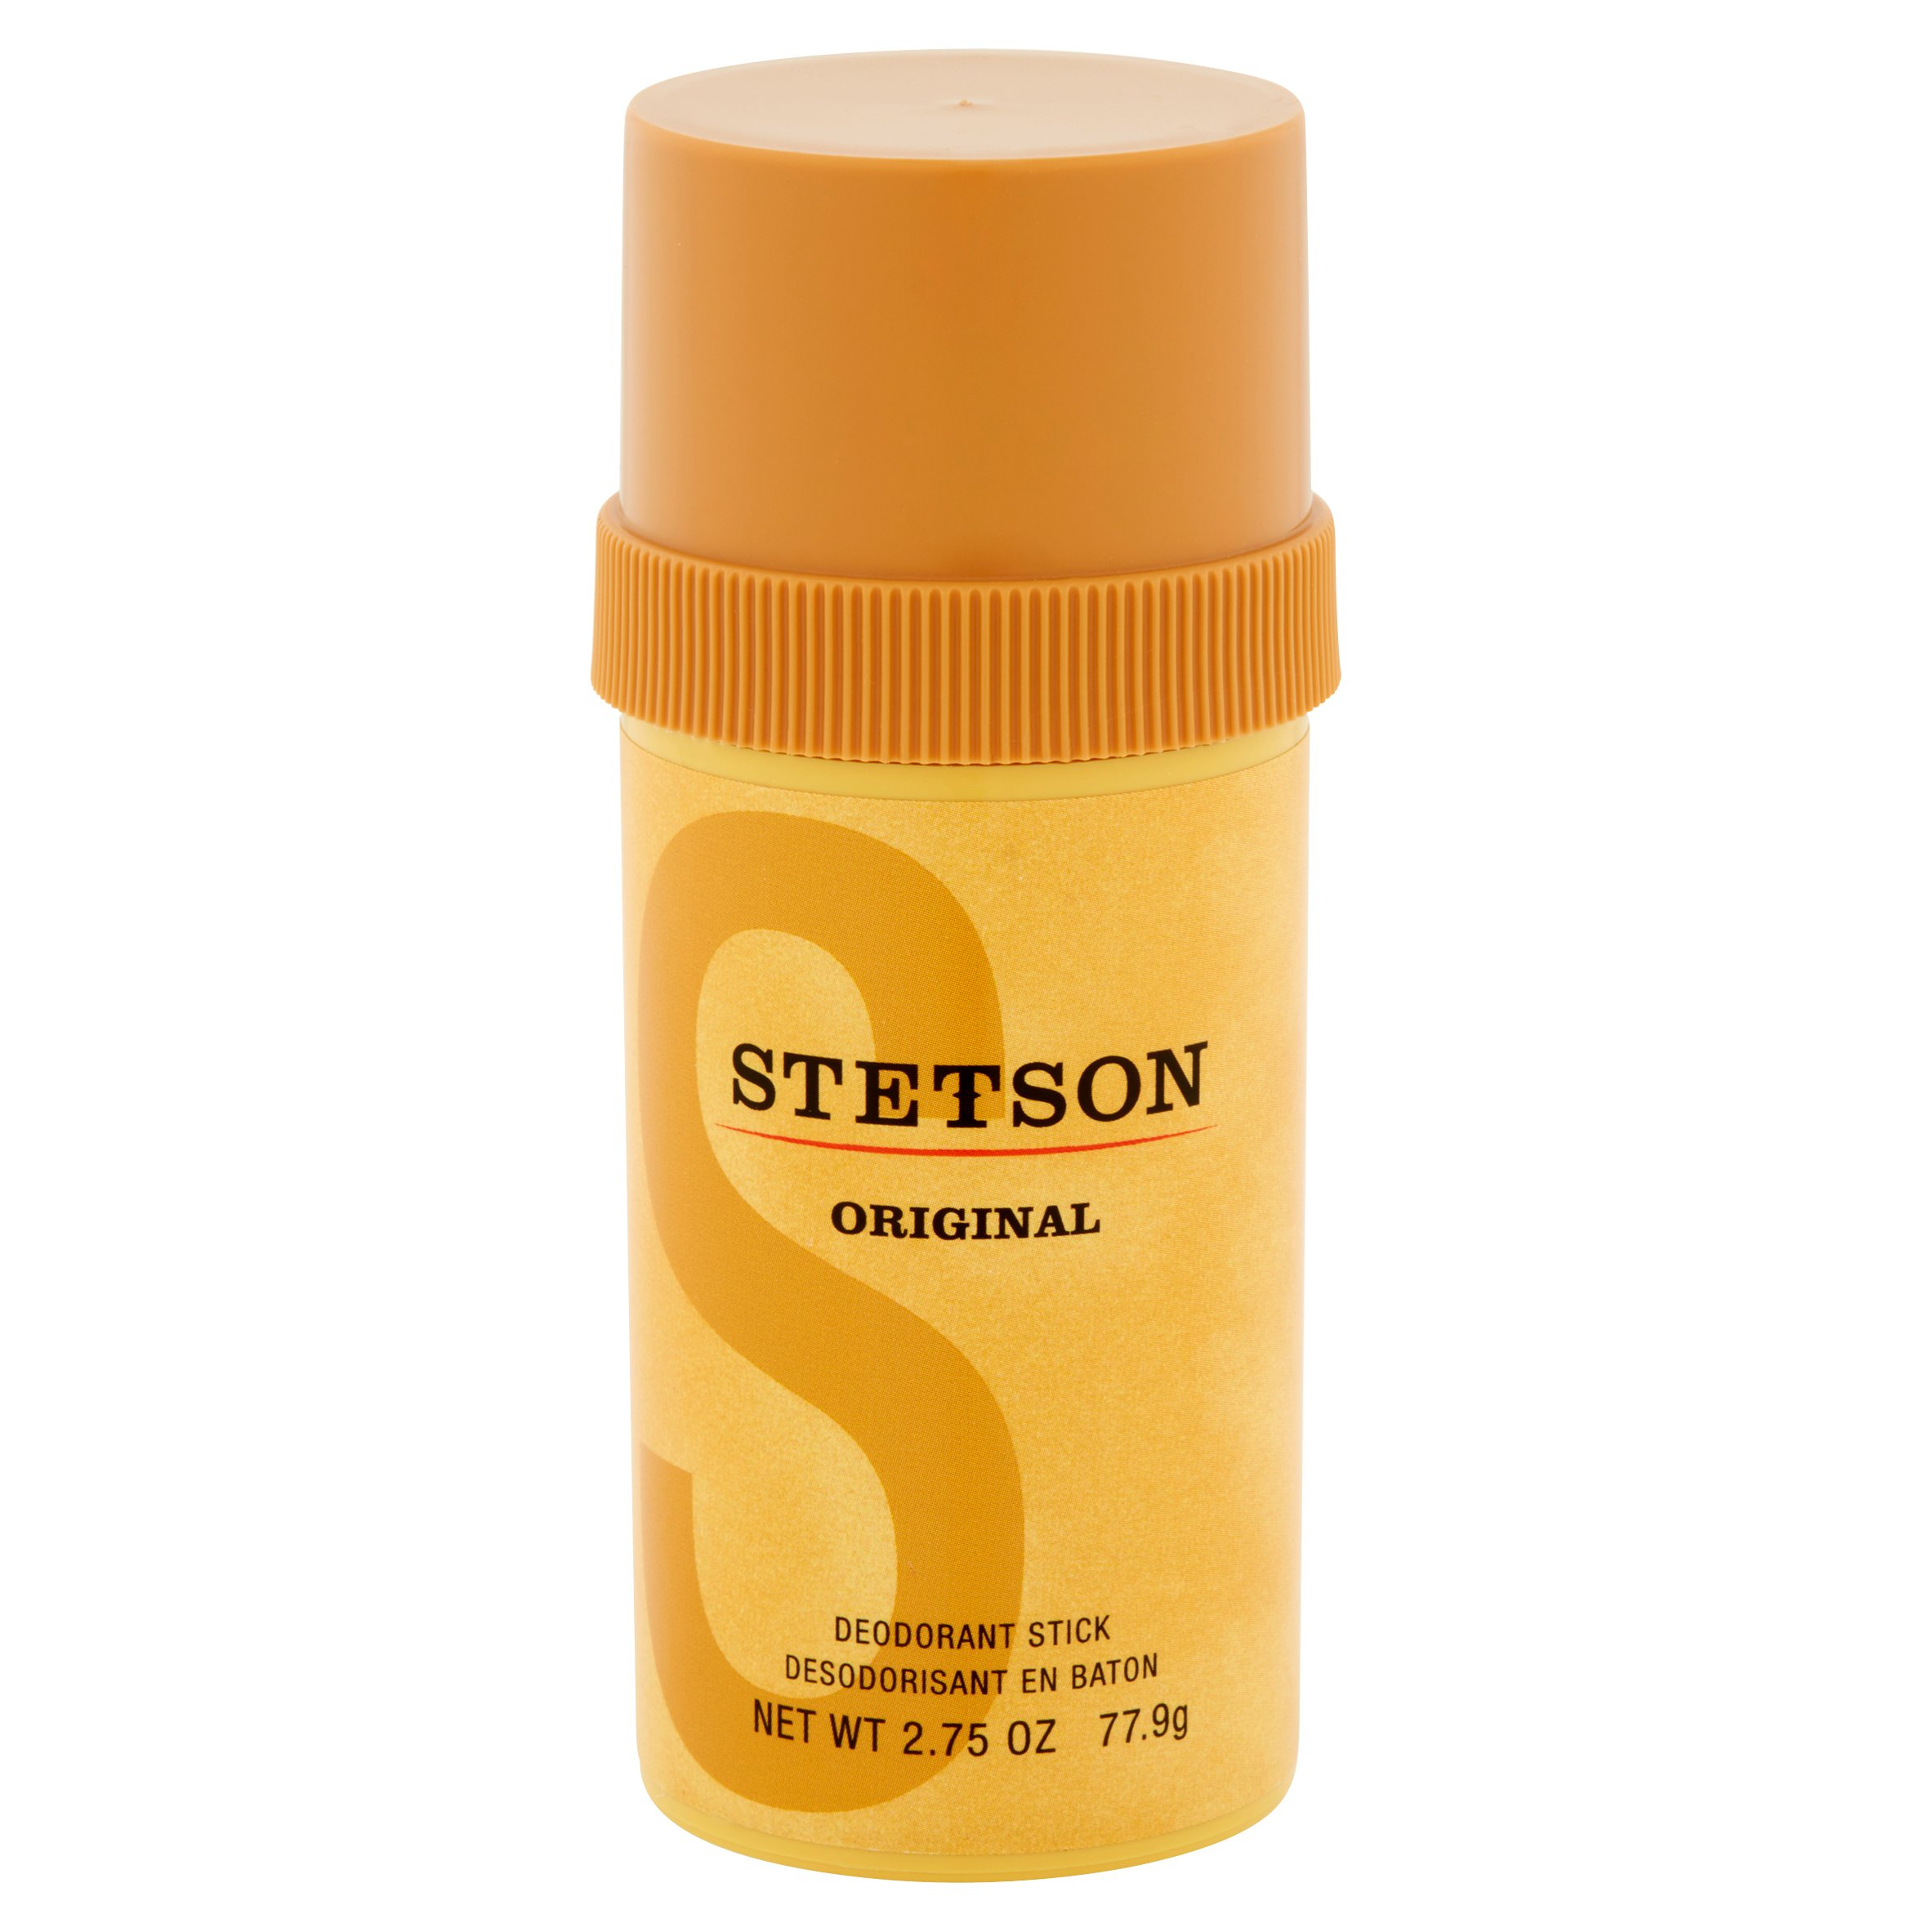 new styles fast delivery latest design Stetson Original Stick Deodorant for Men, 2.75 fl oz